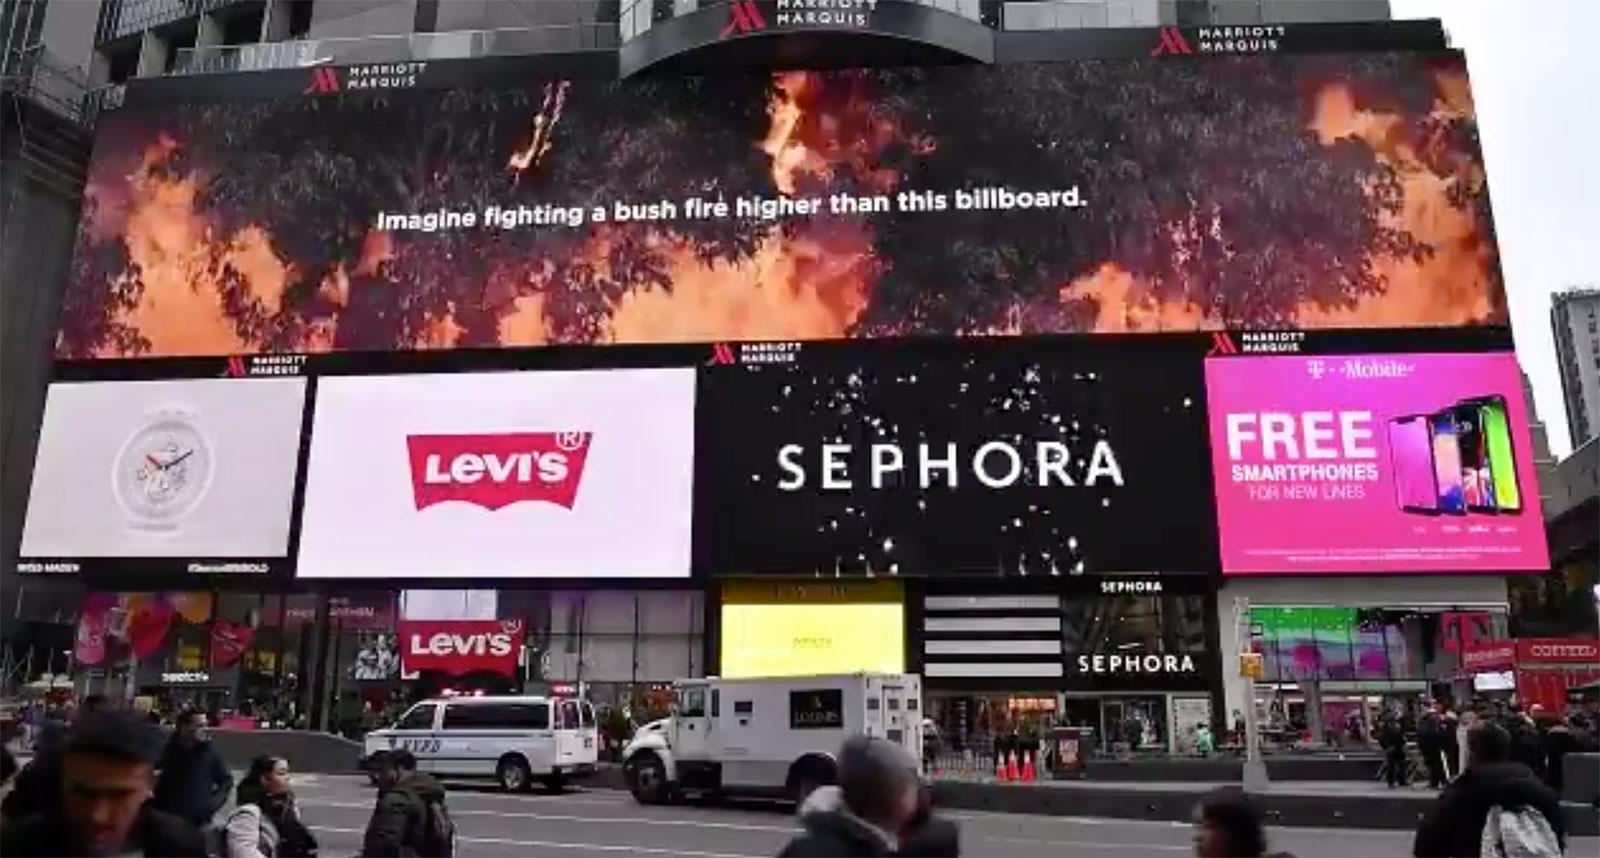 Massive Times Square billboard thanks the firefighters who battled Australia's devastating fires